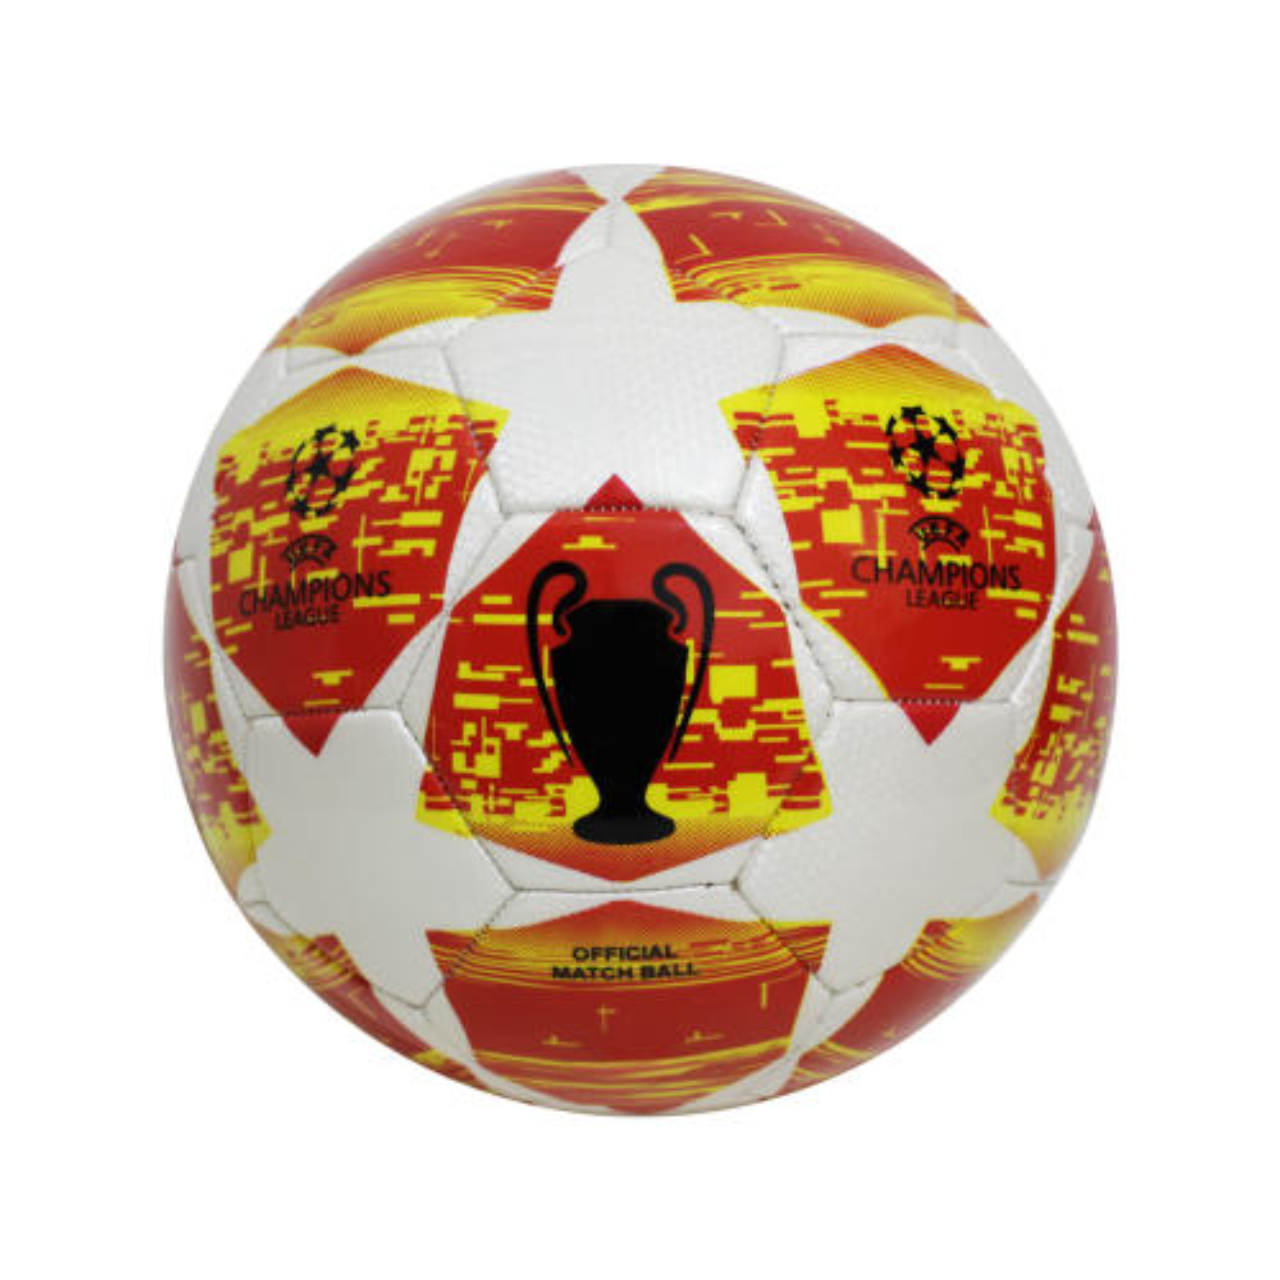 توپ فوتبال مدل Champions League GKI 1220